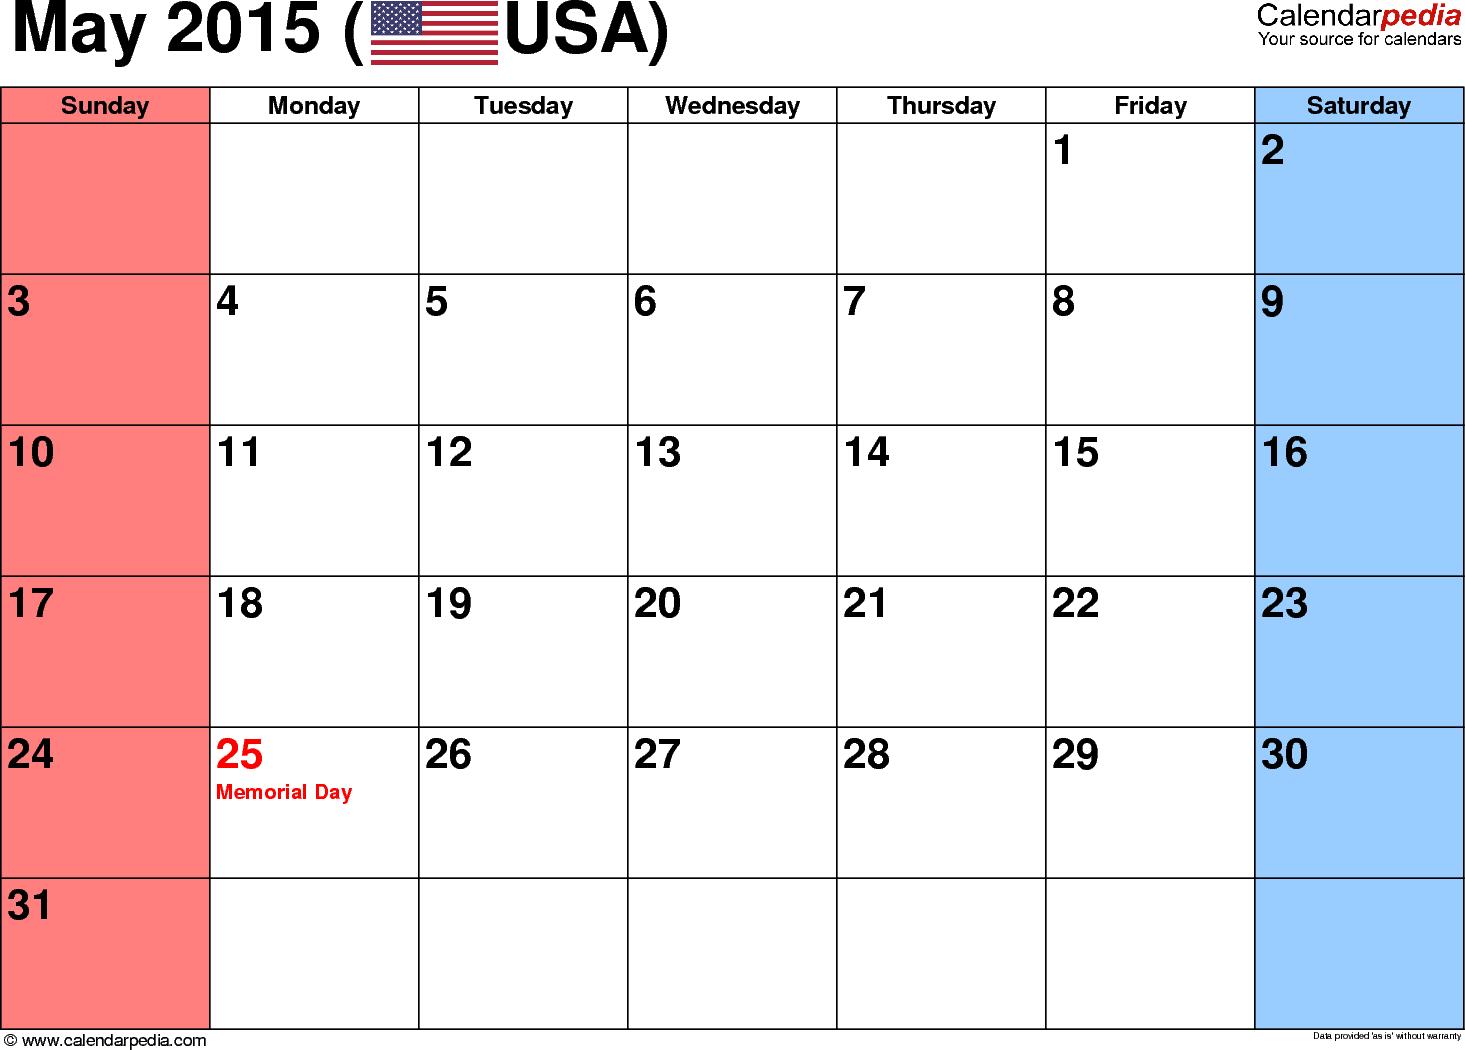 Blank May 2015 calendar